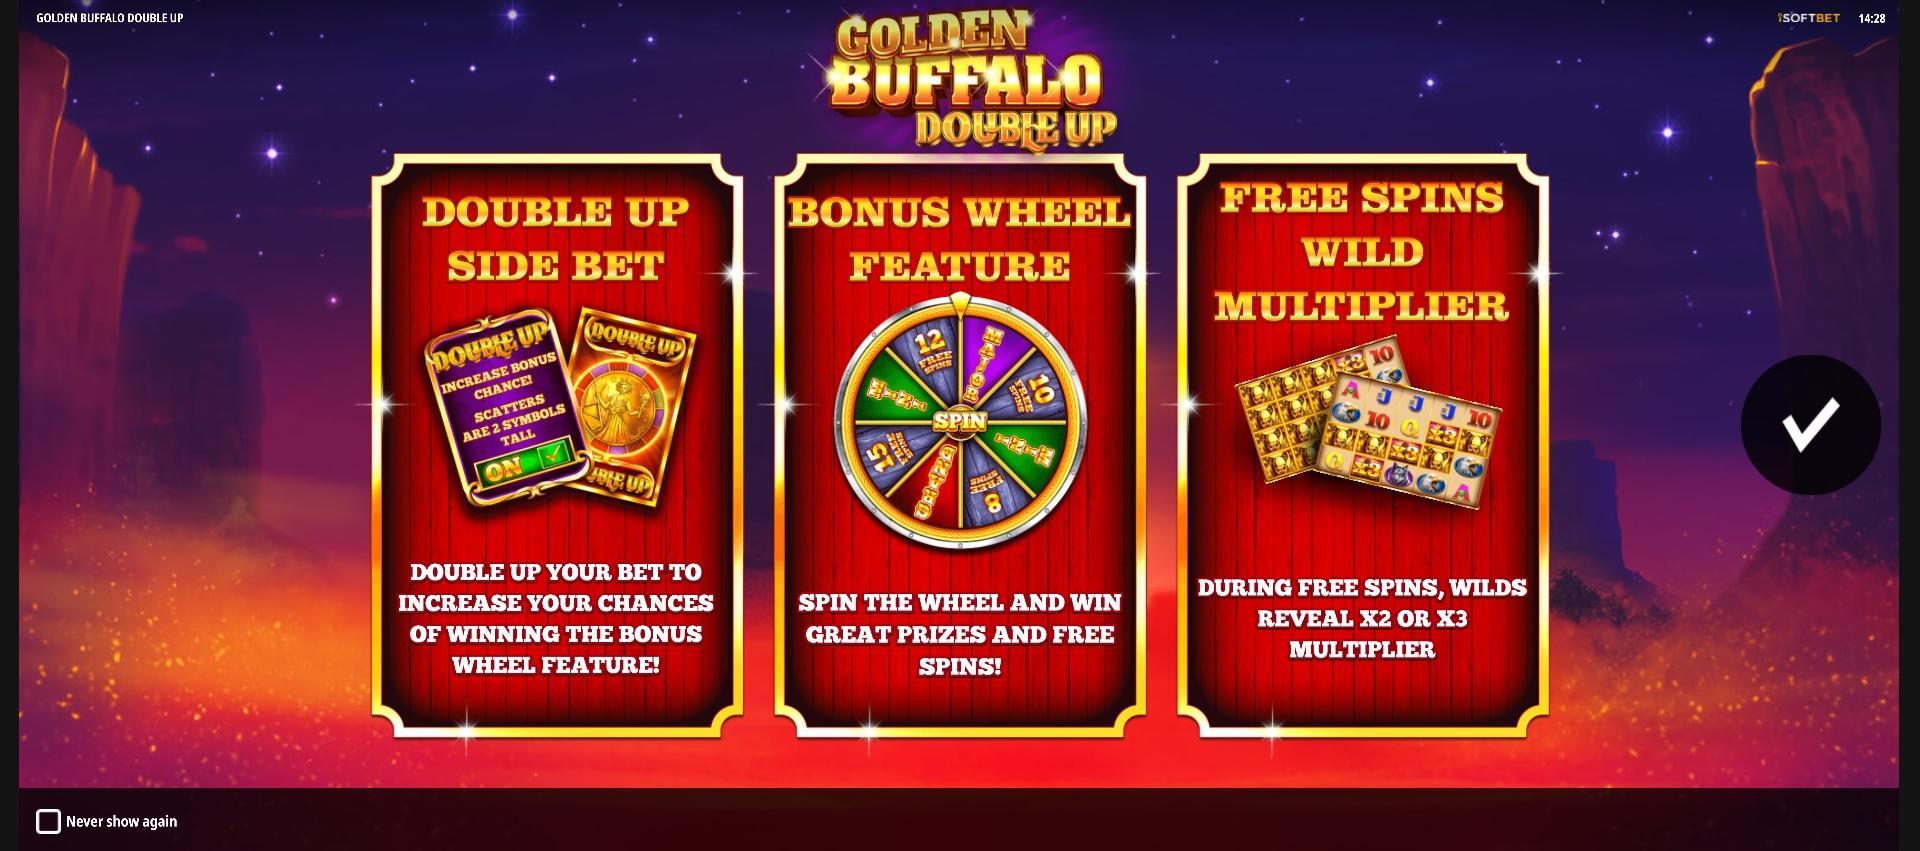 Golden Buffalo: Double Up – Splash Screenl